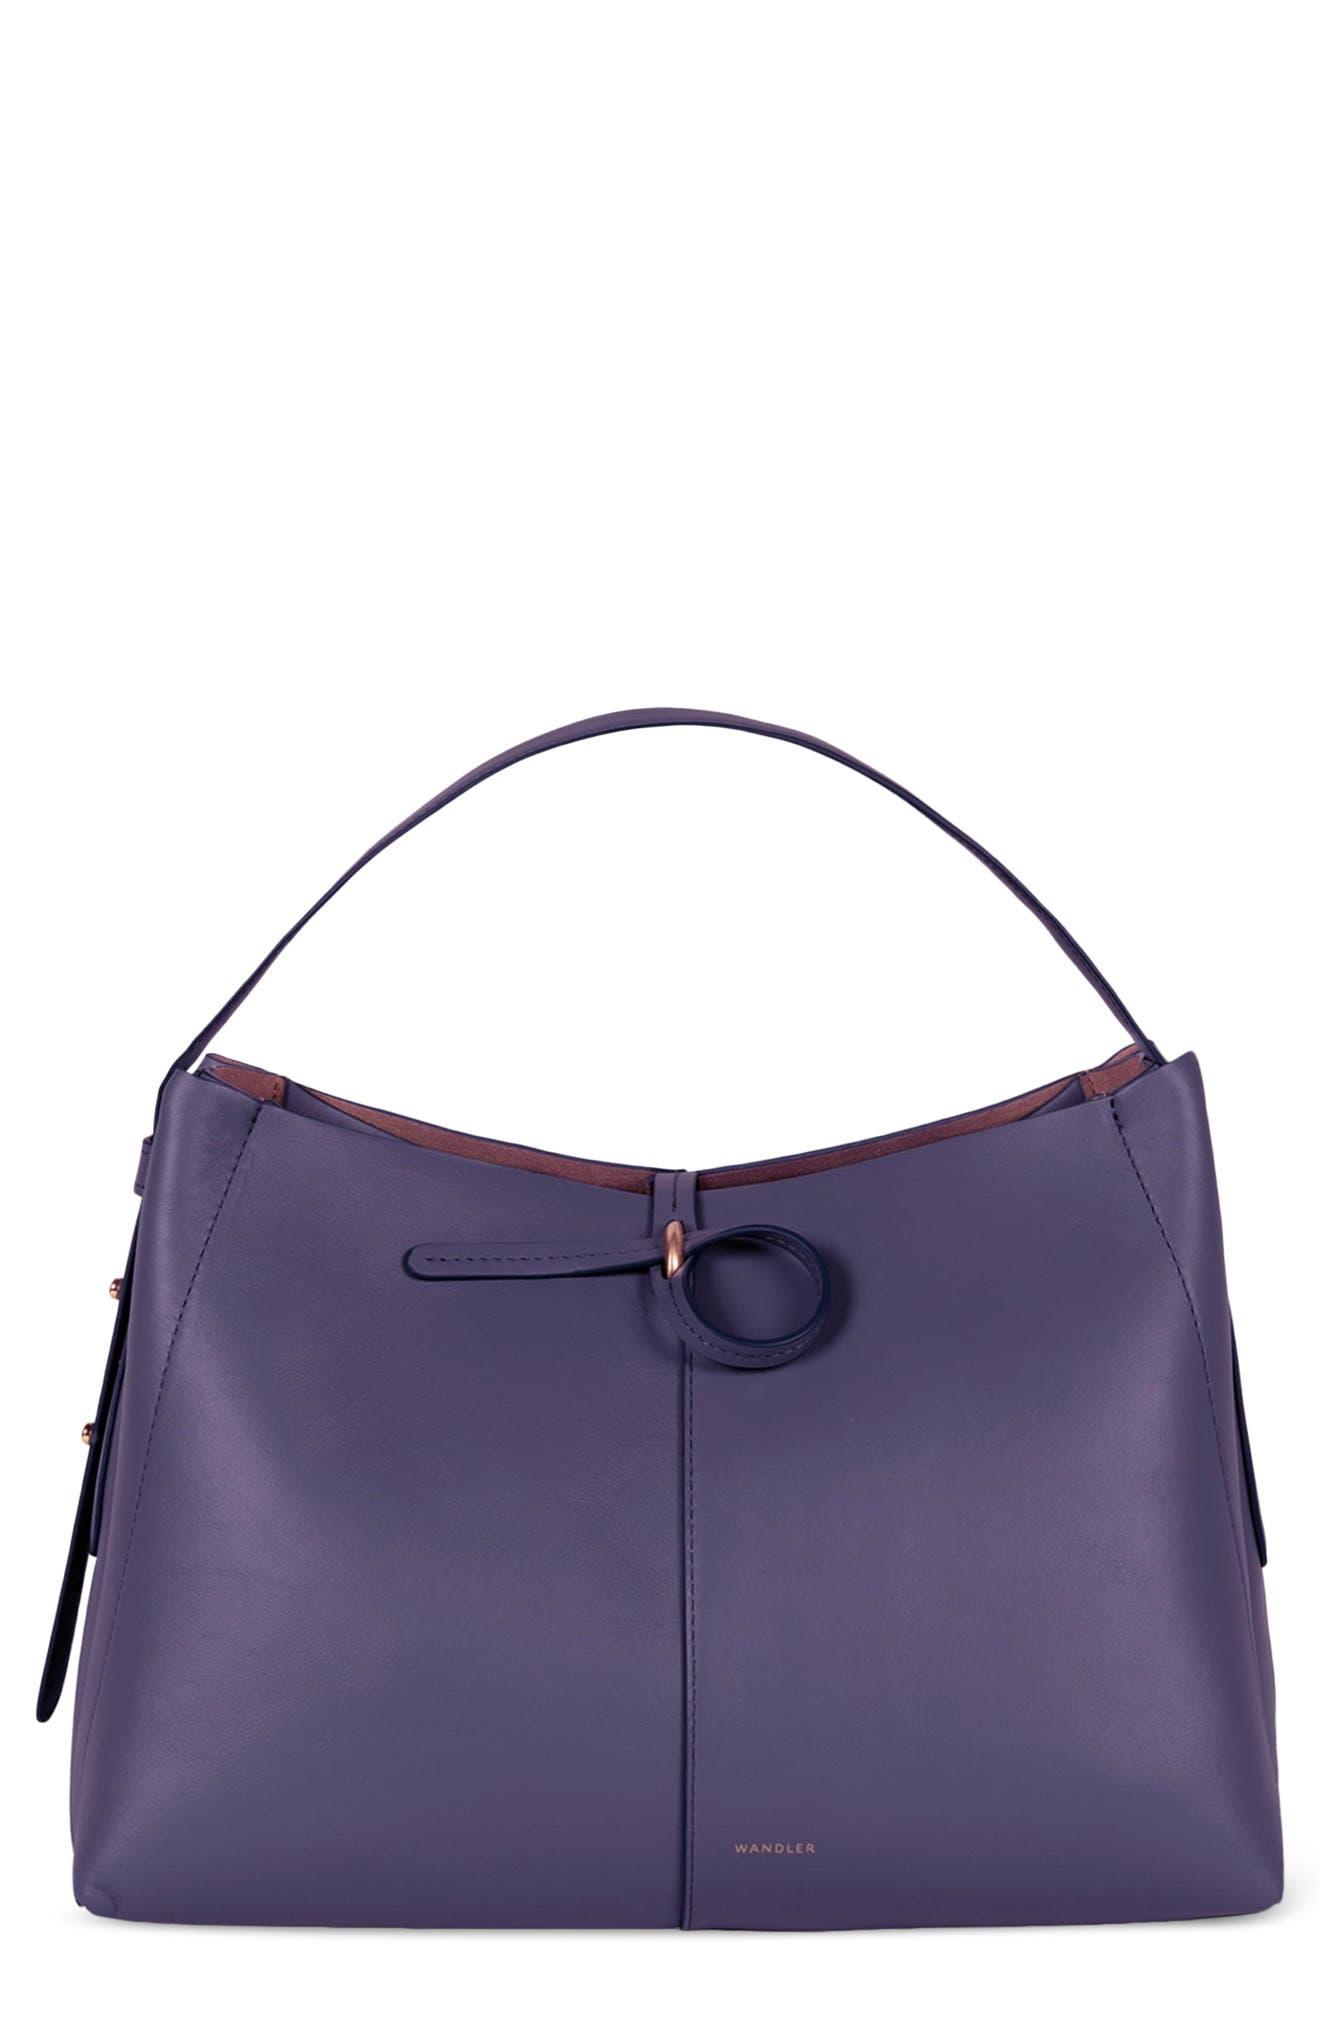 Small Satchel Purple Leather Purse